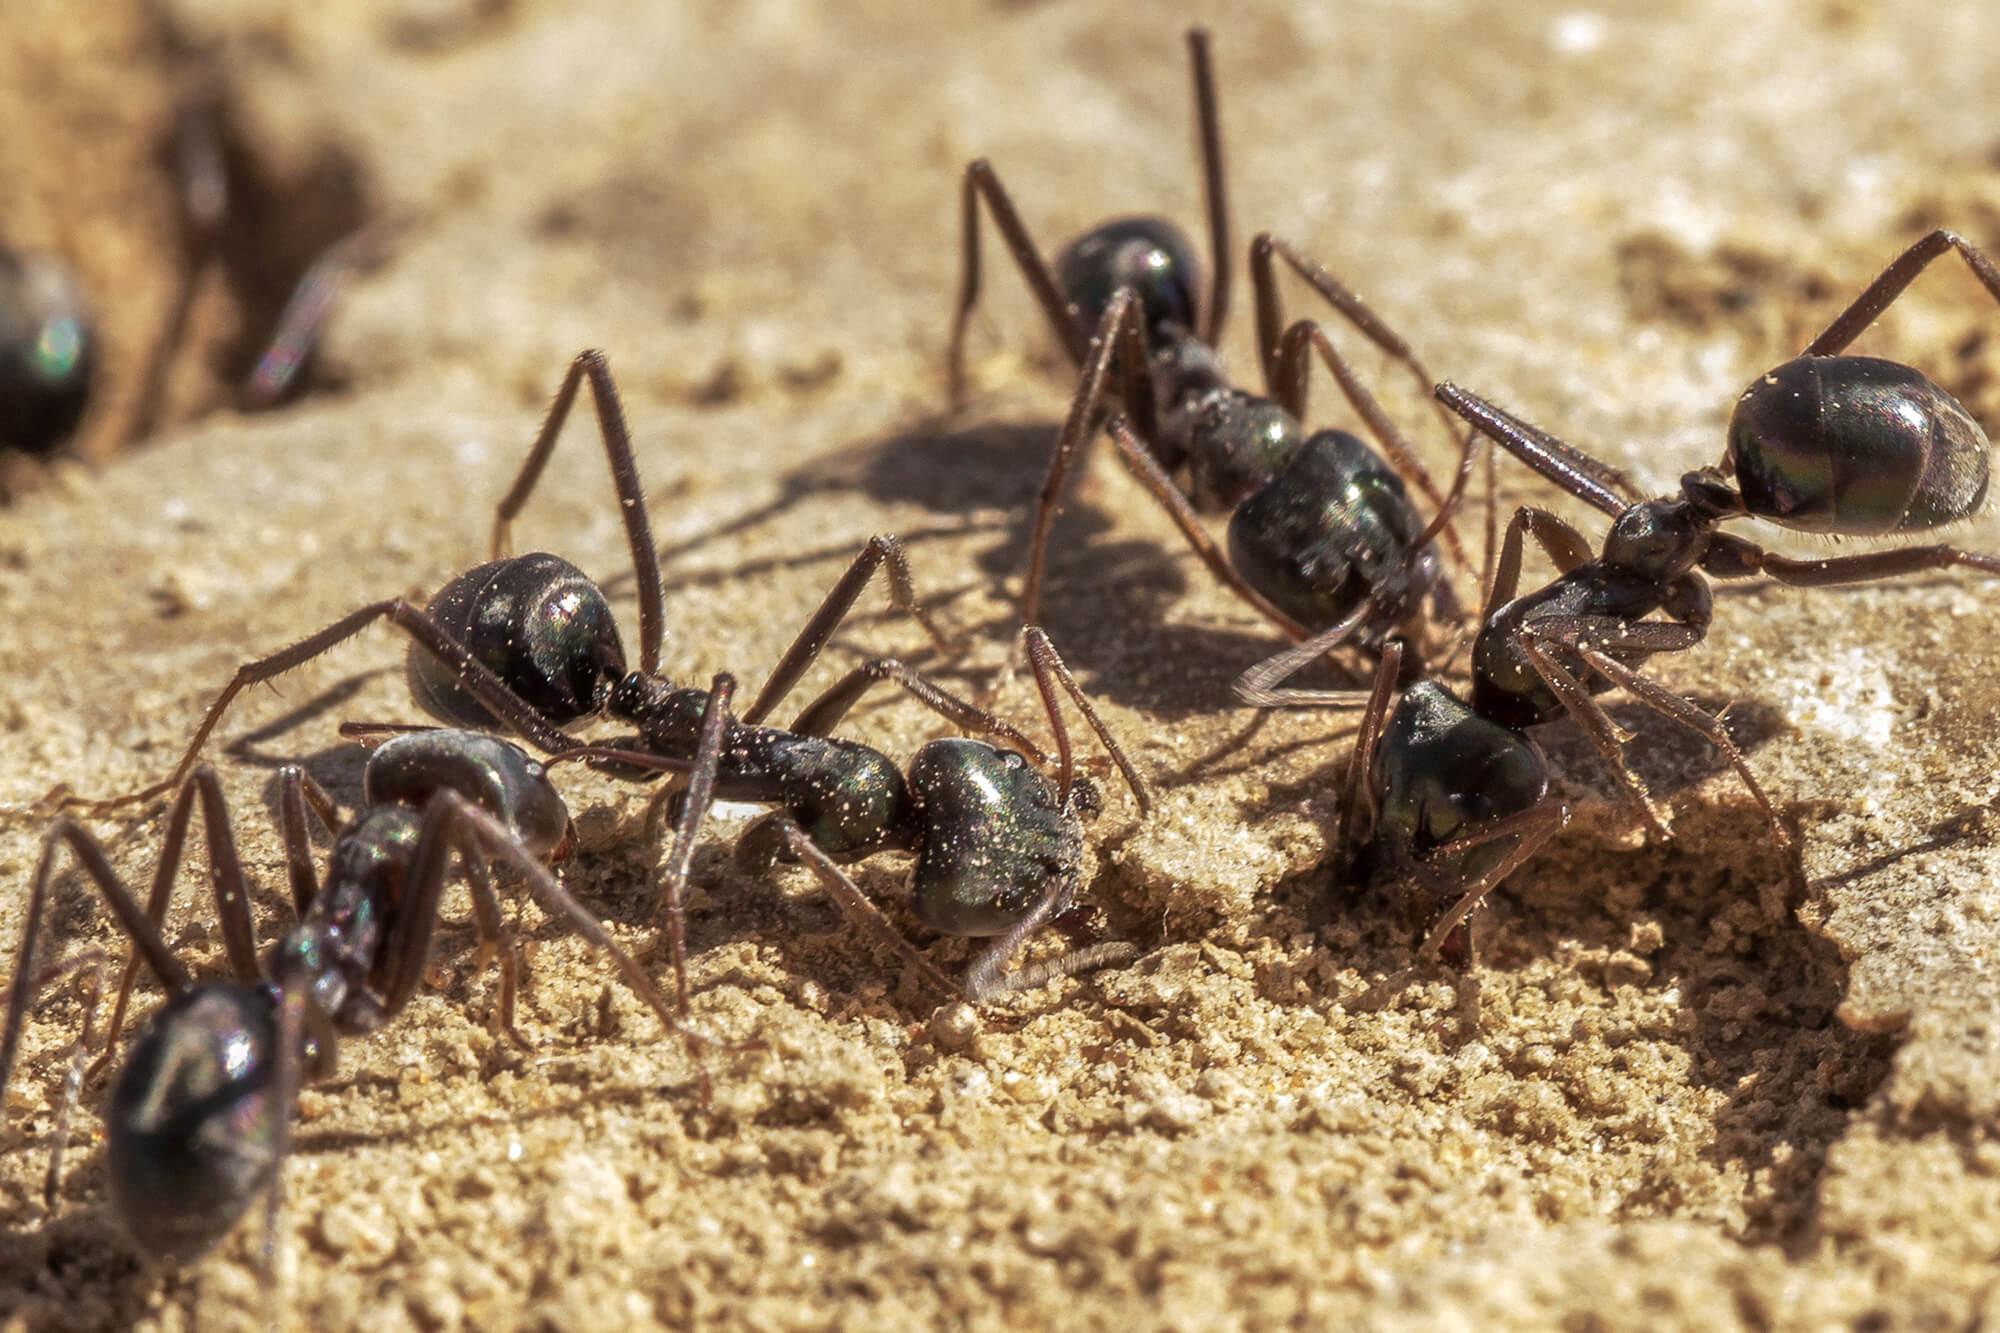 ants excavating a biocrust